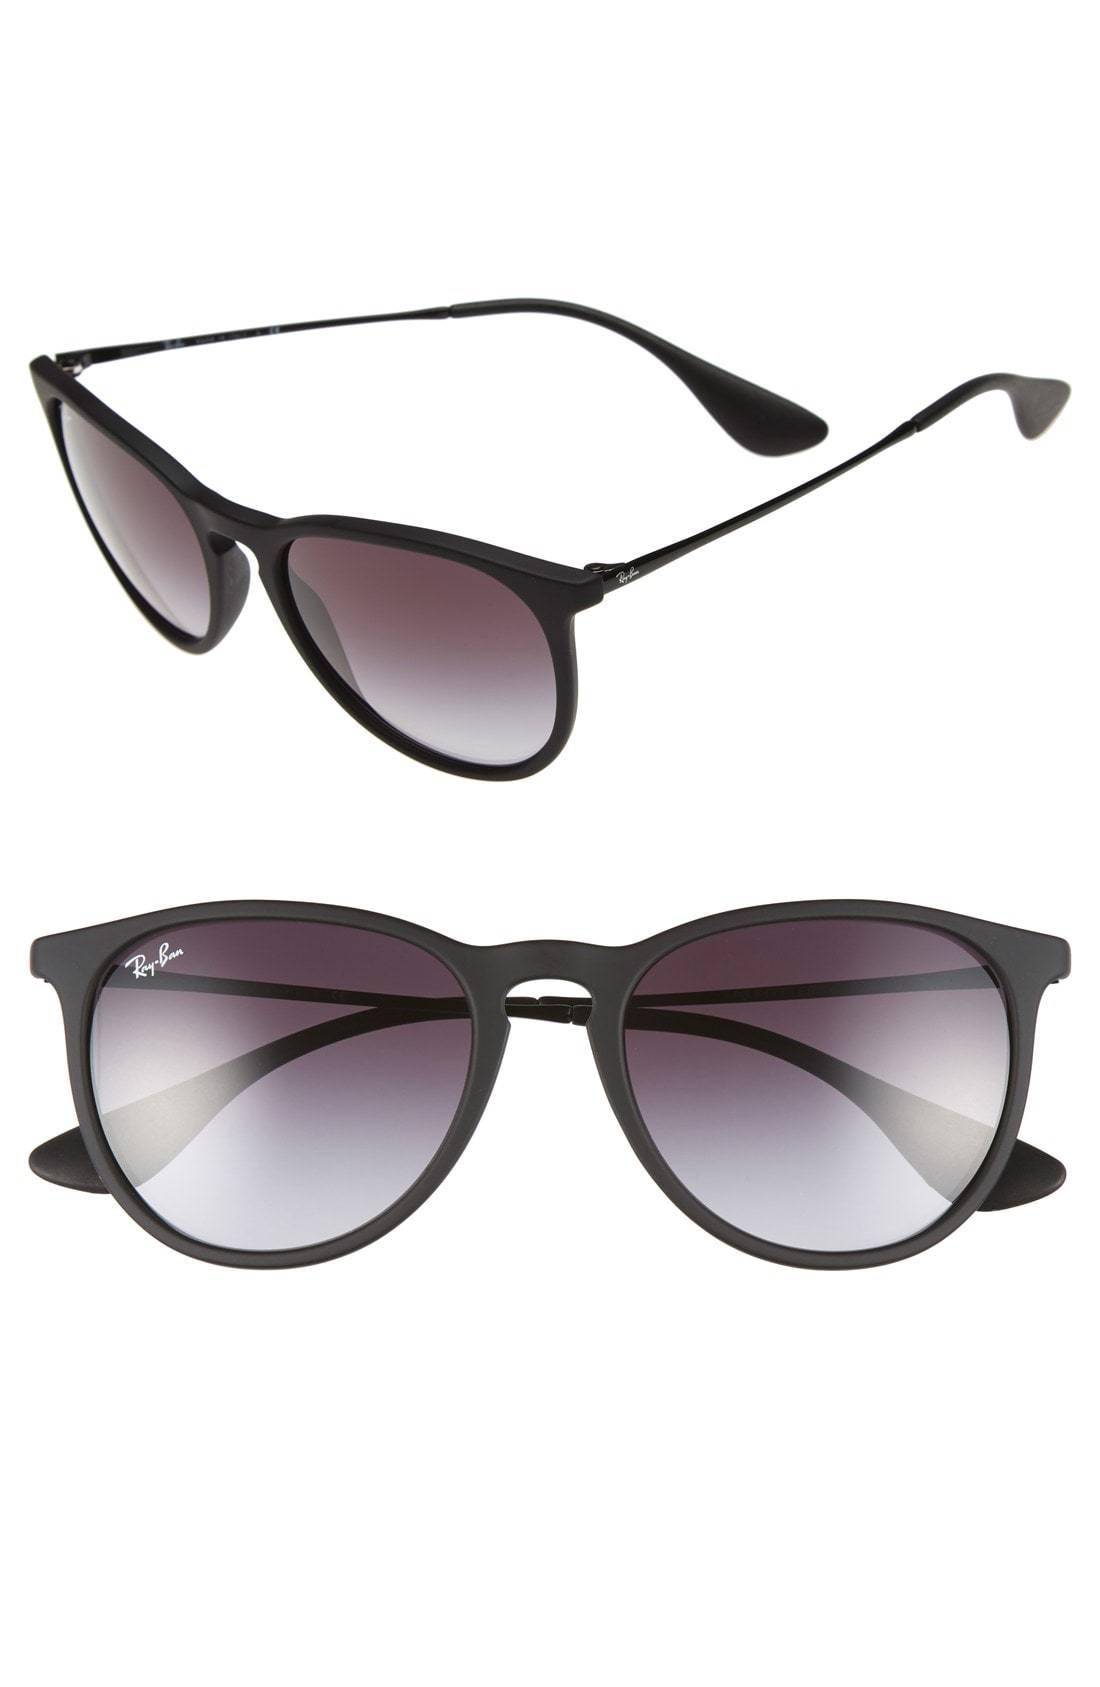 Ray-Ban 54mm Keyhole Sunglasses